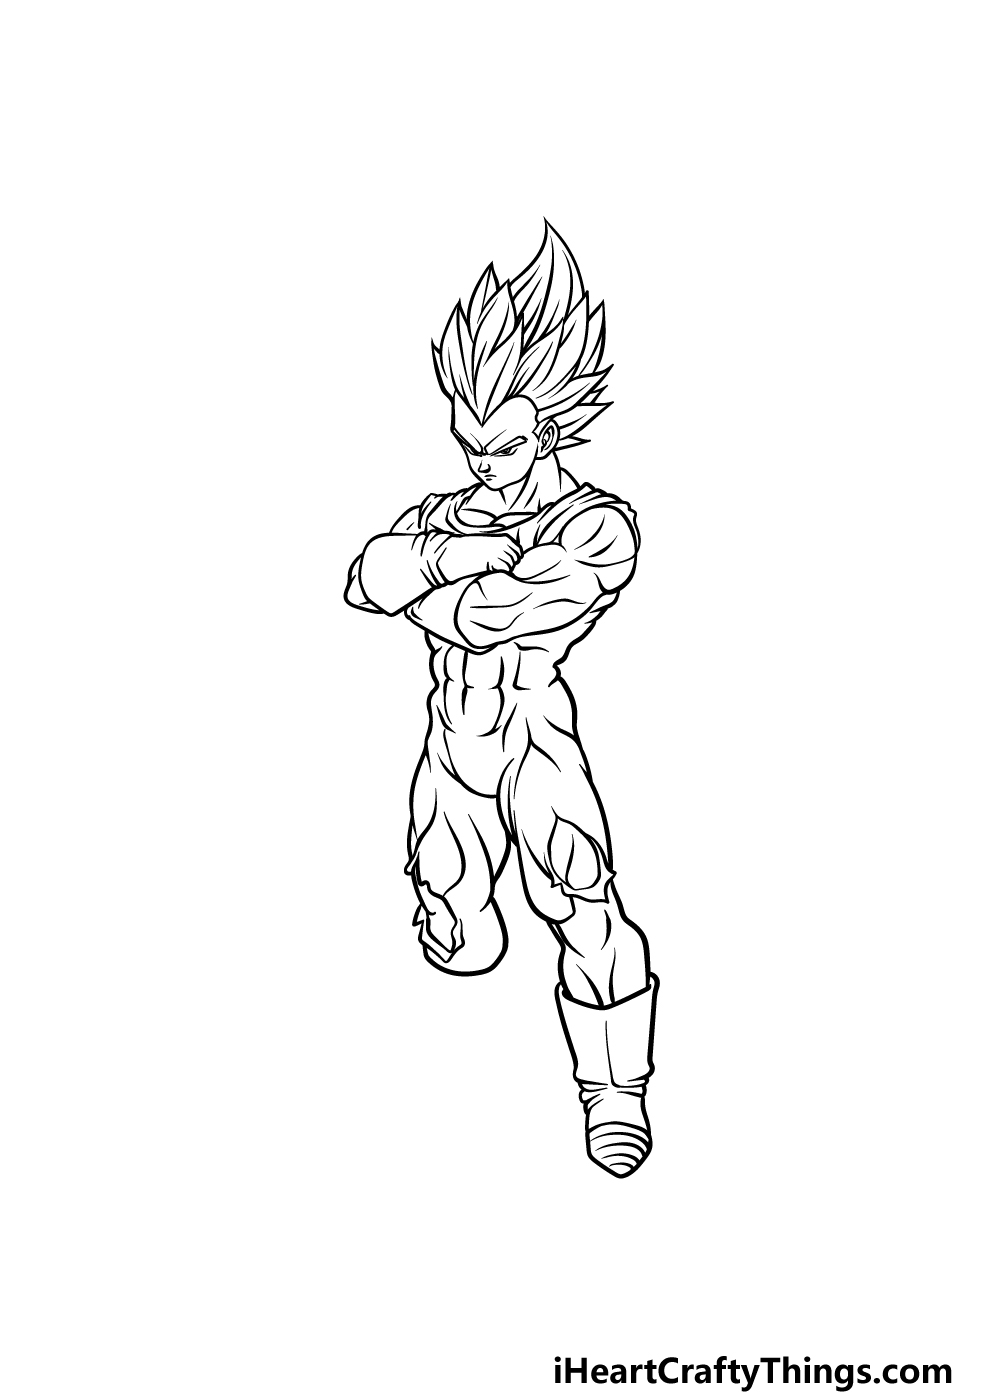 drawing Vegeta step 4